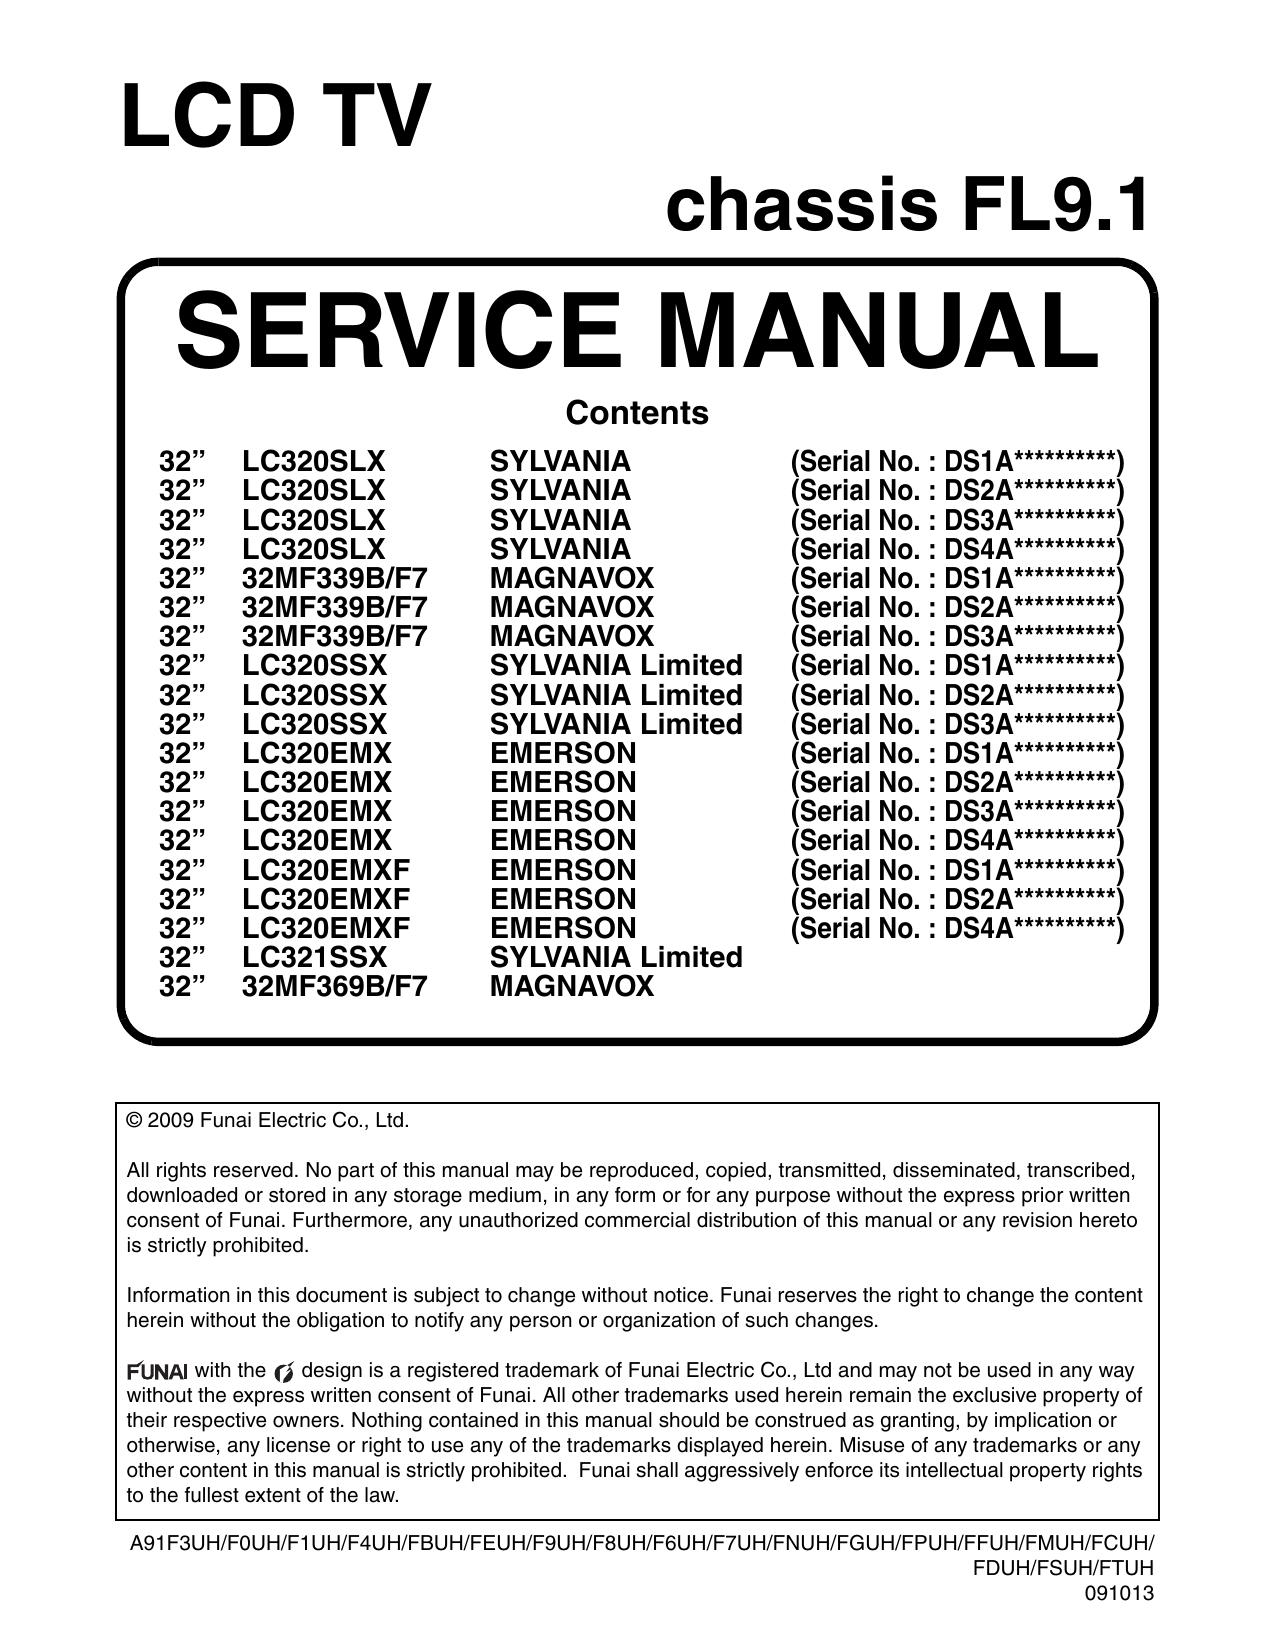 SERVICE MANUAL - Encomp Parts | manualzz.com on